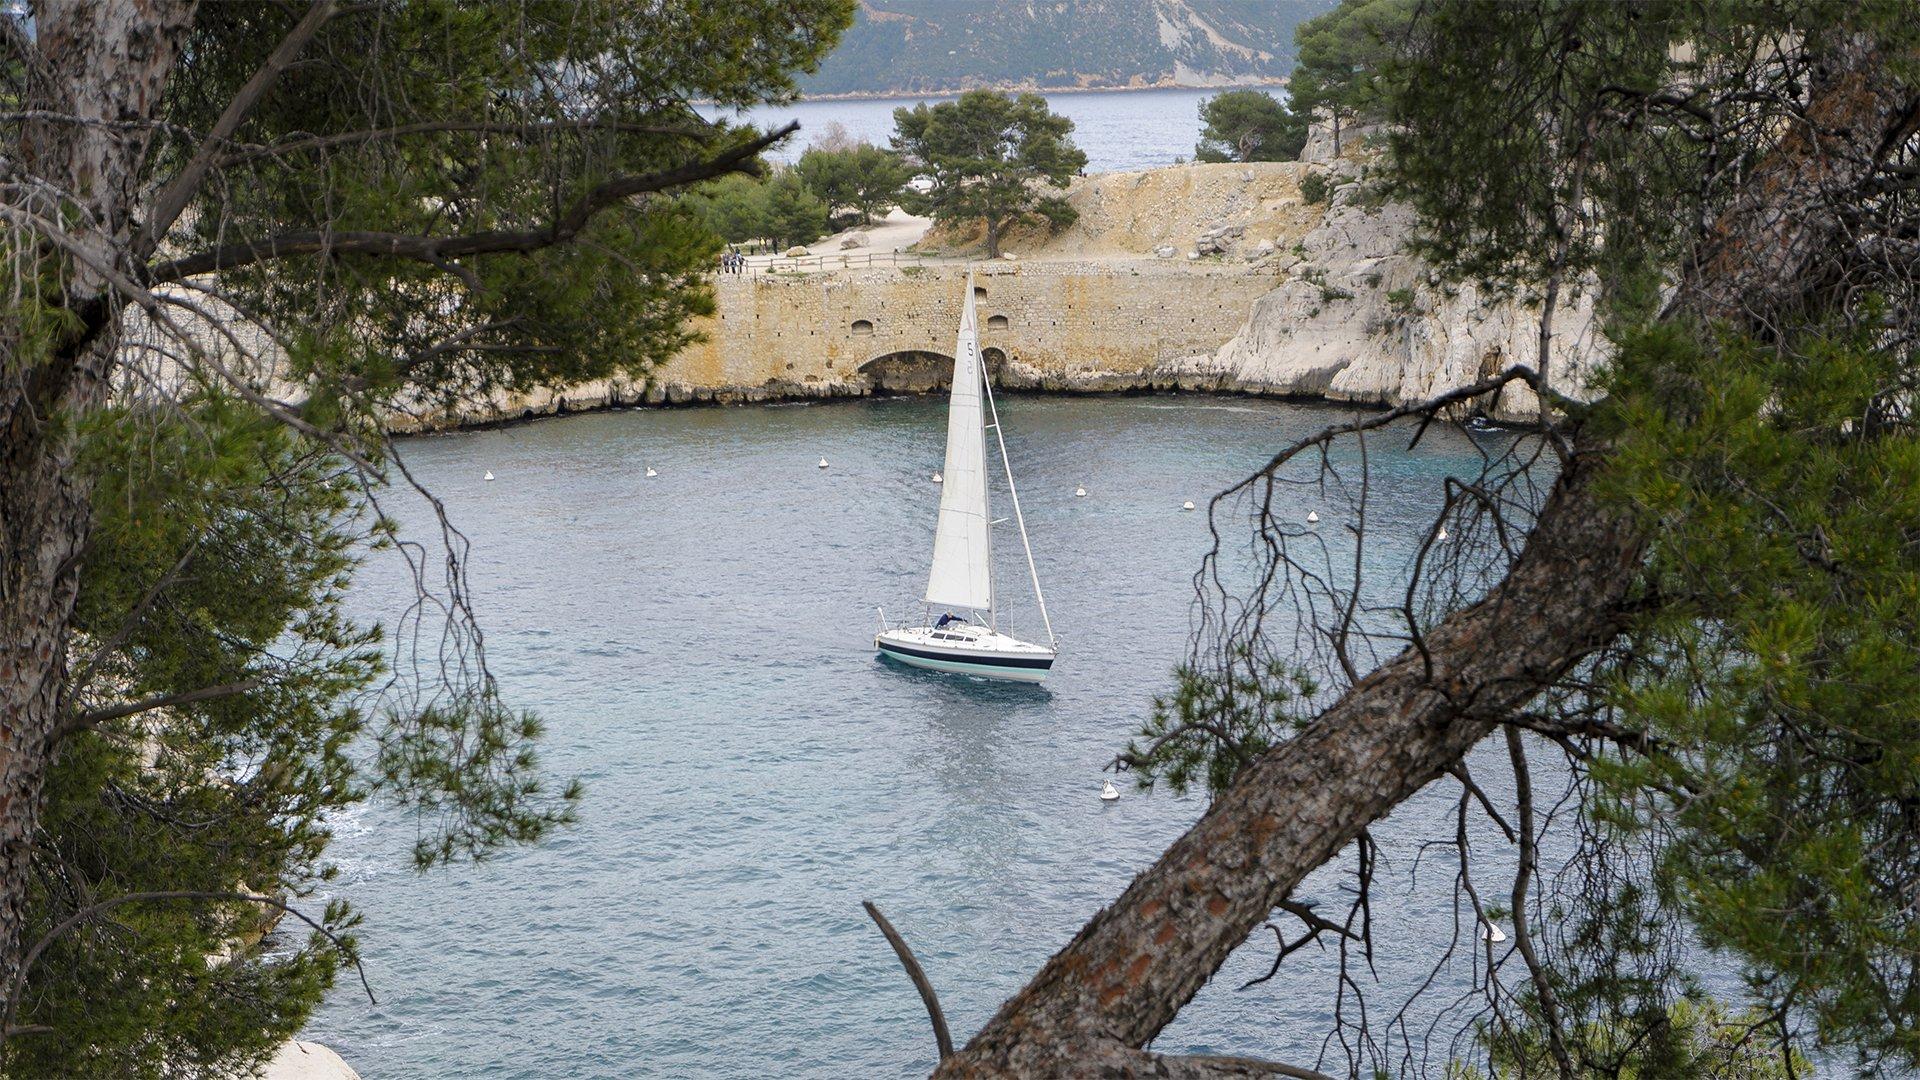 fond Méditerranée - Episode 3